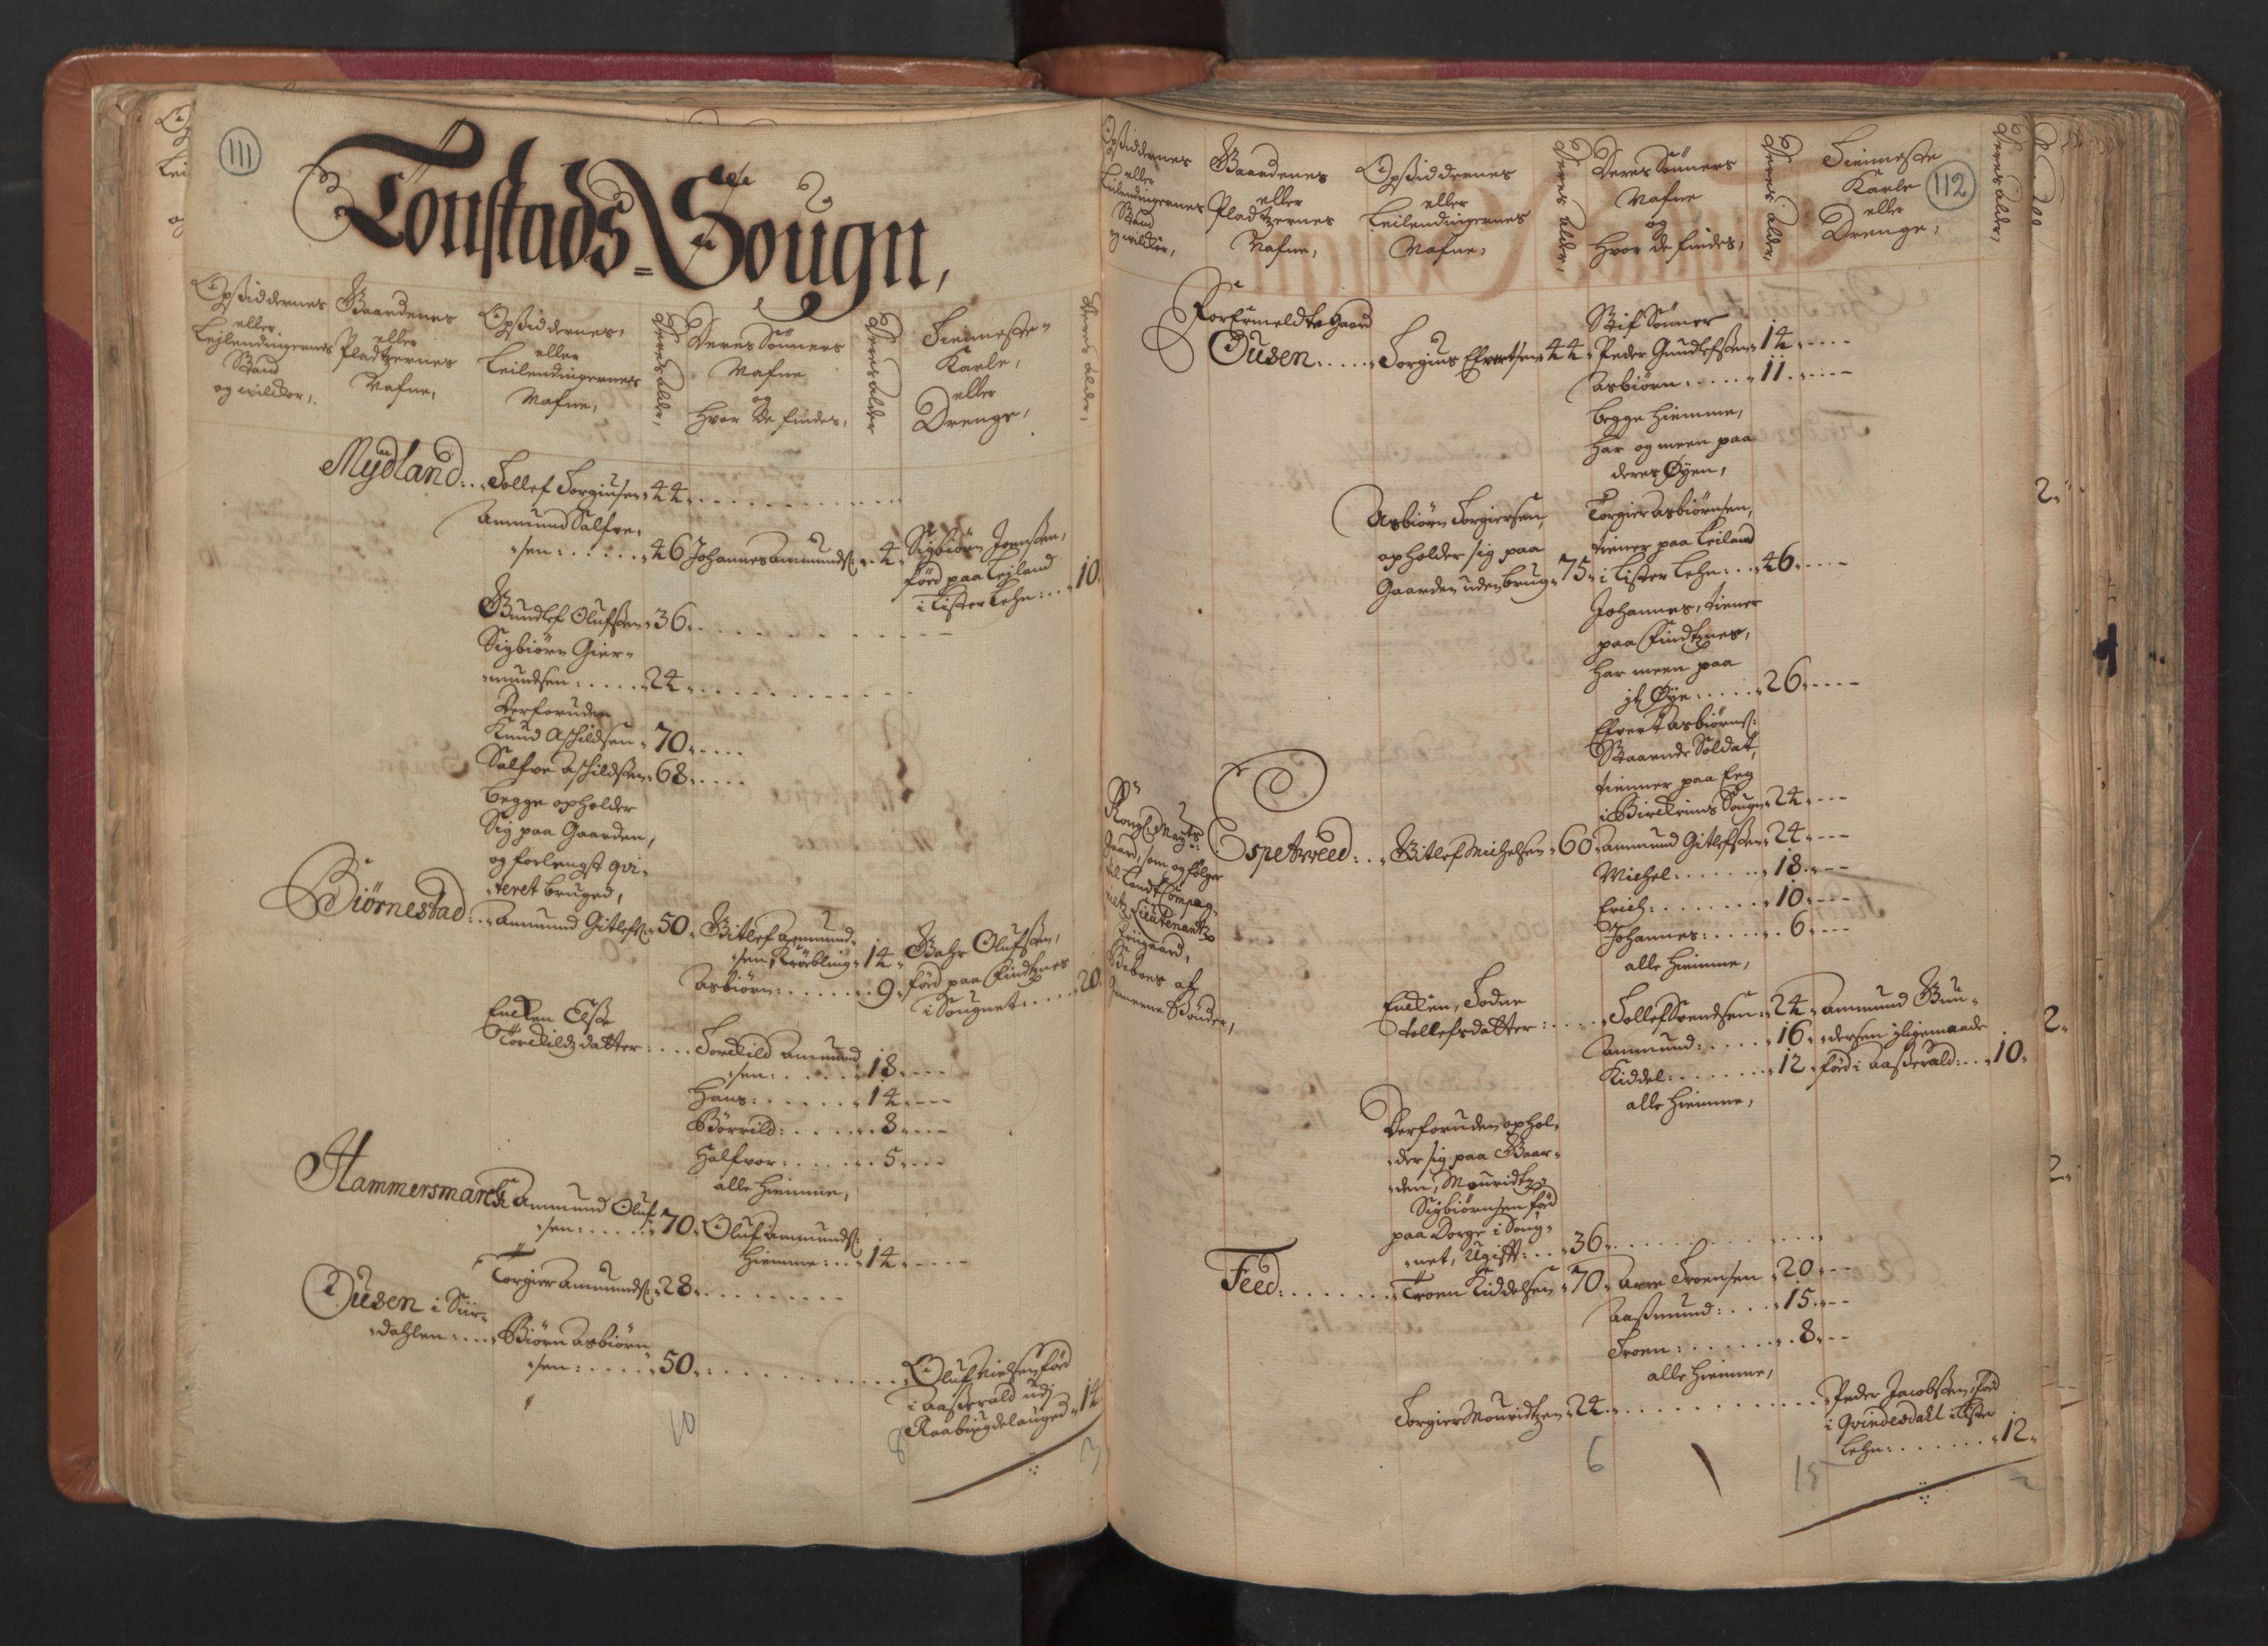 RA, Manntallet 1701, nr. 4: Jæren og Dalane fogderi, 1701, s. 111-112